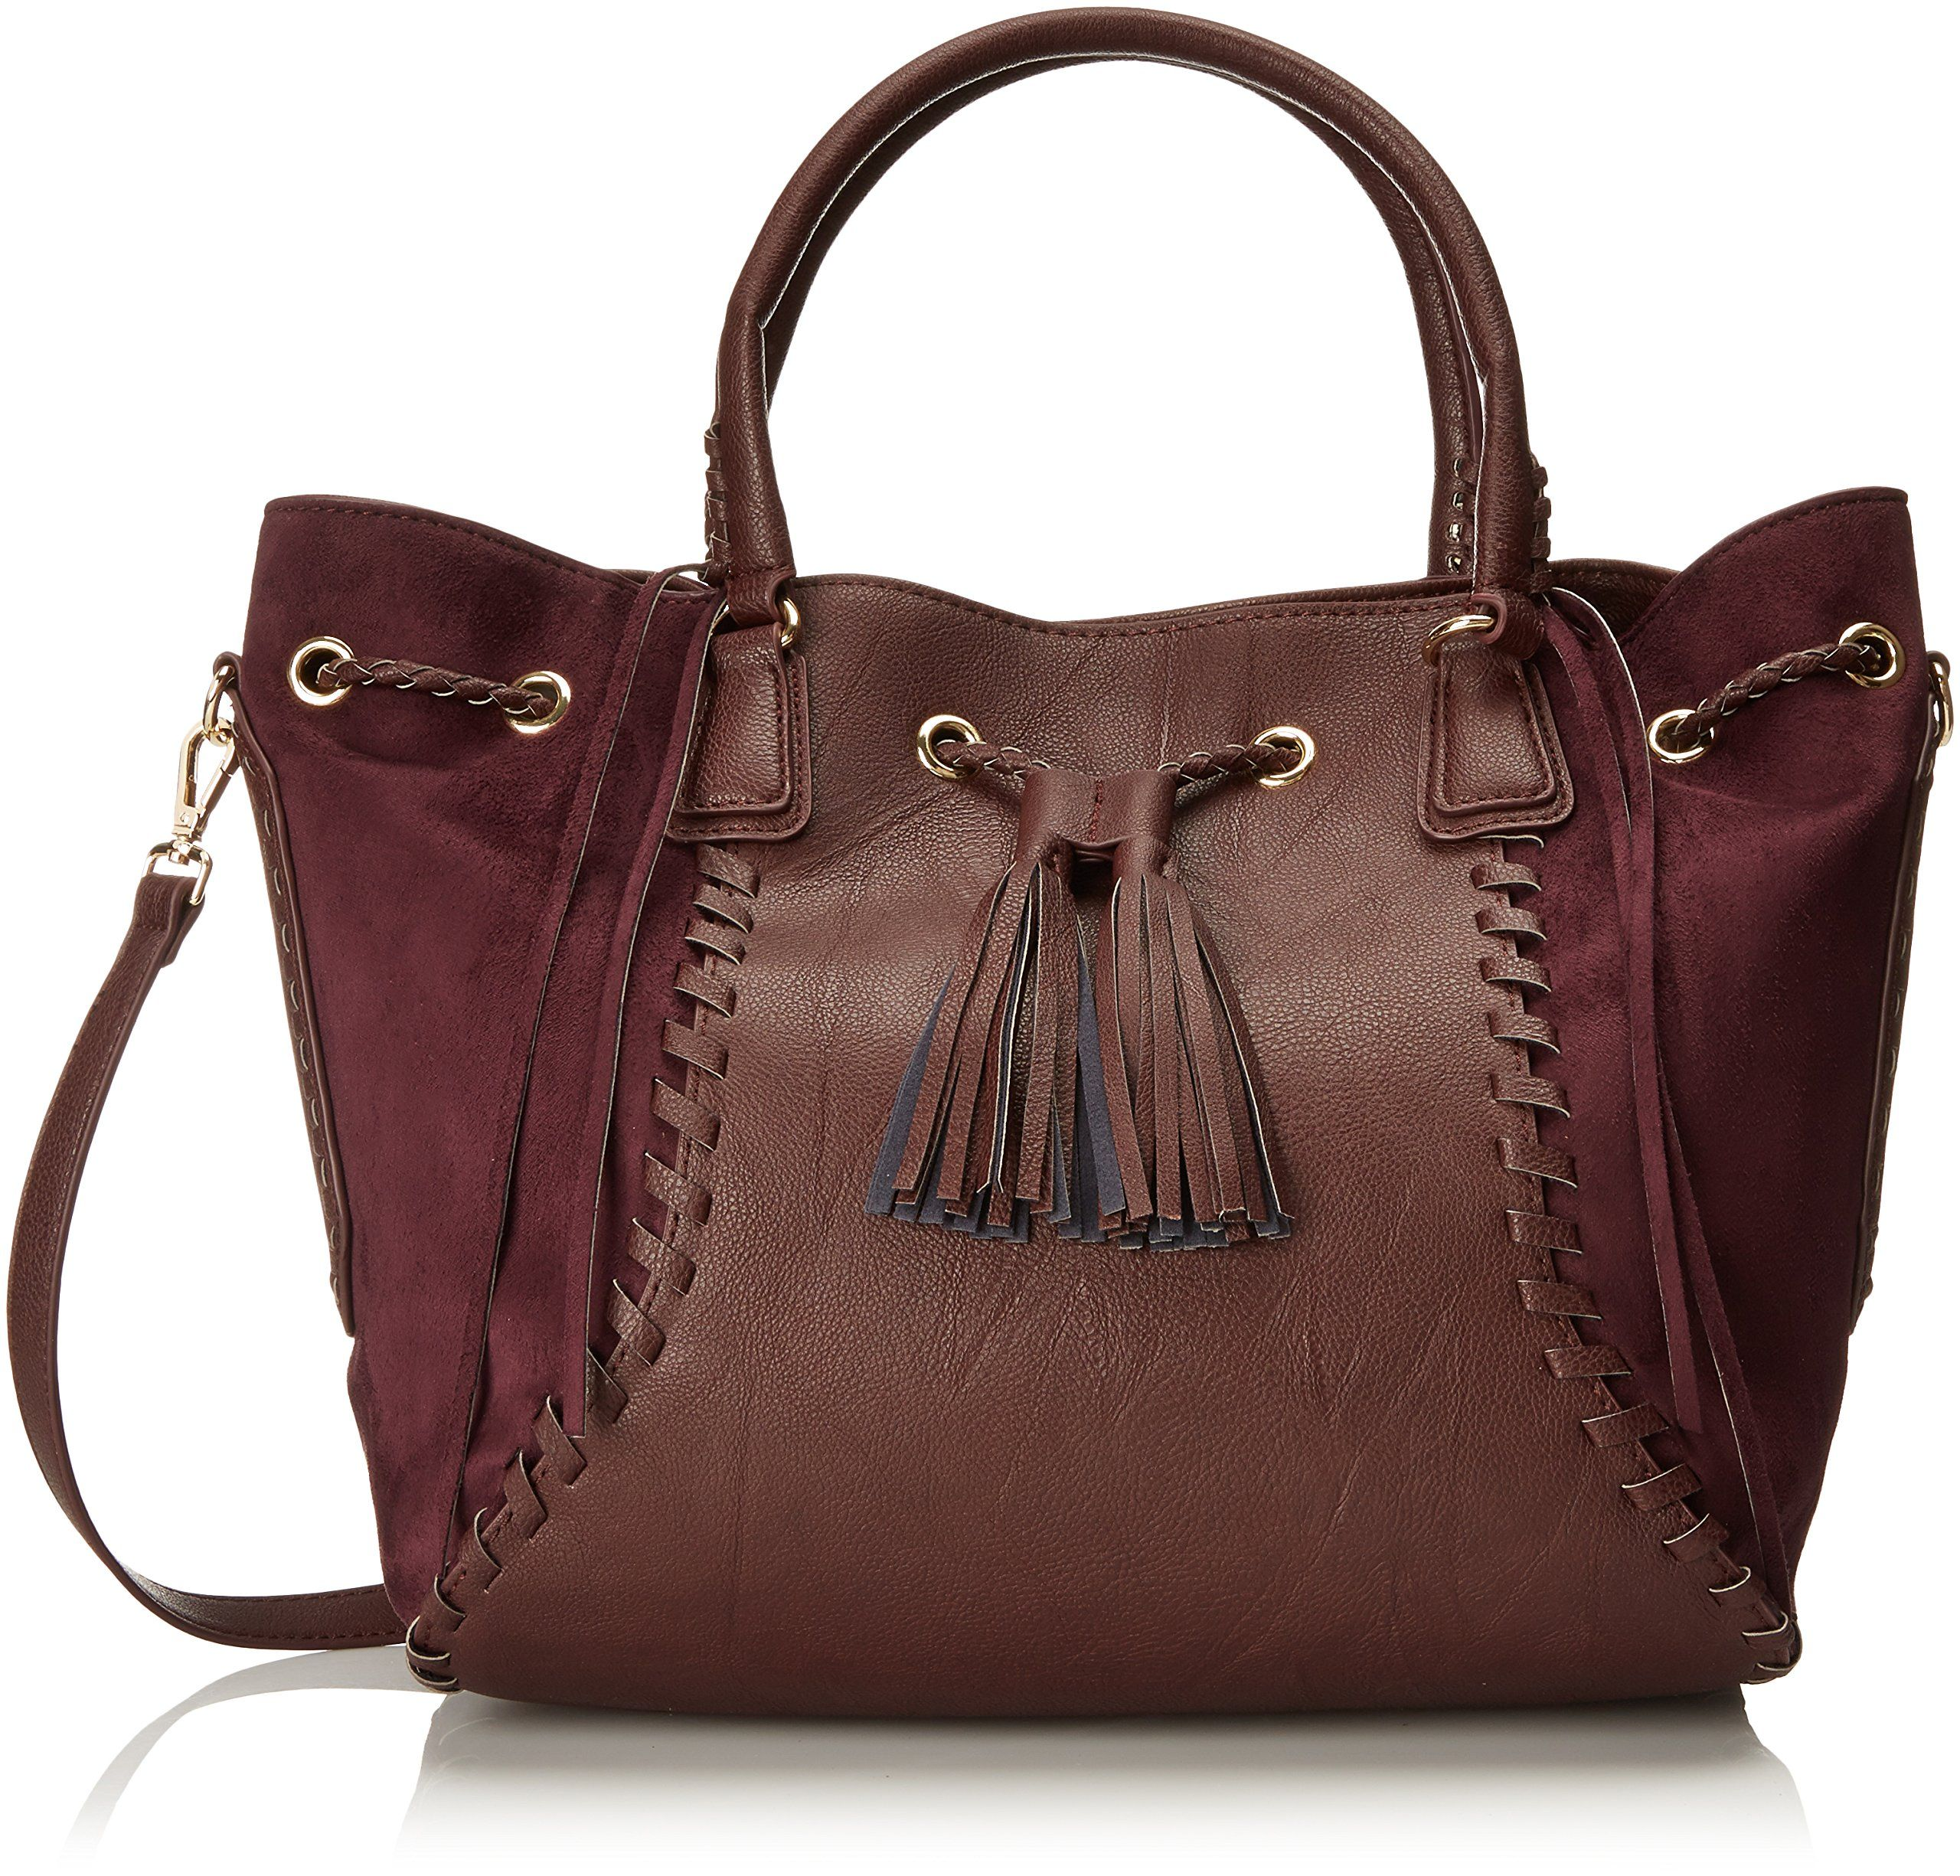 0b7341102a88 Big Buddha Handbags Bristow Satchel With Crossbody Strap - Cognac  Handbags   Amazon.com